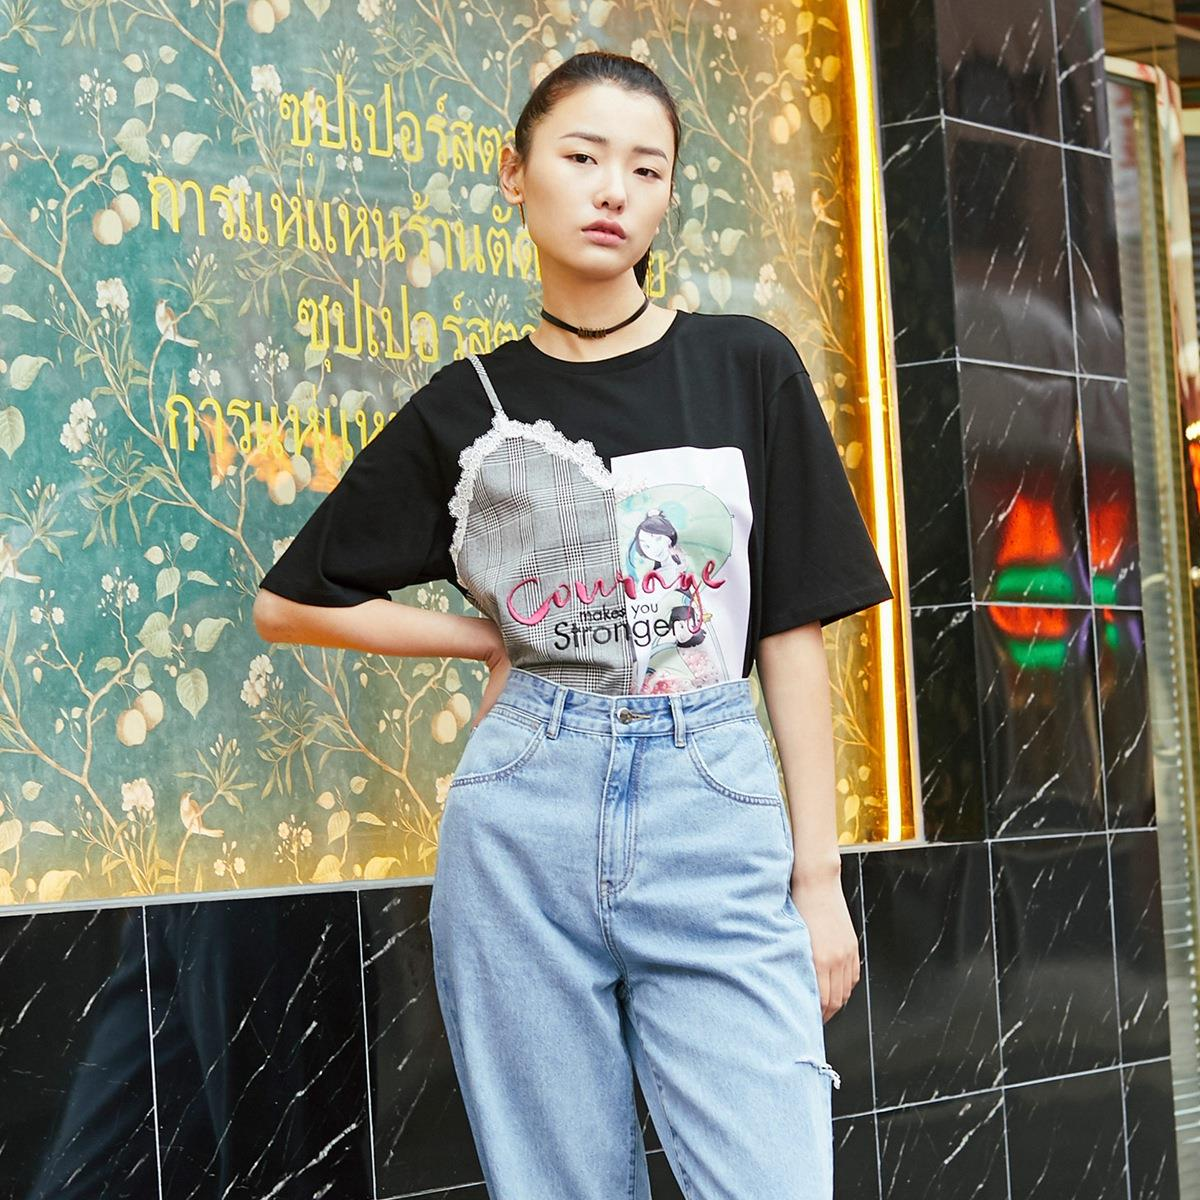 Vero Moda 花木兰联名 3202T1537S59  女士短袖T恤